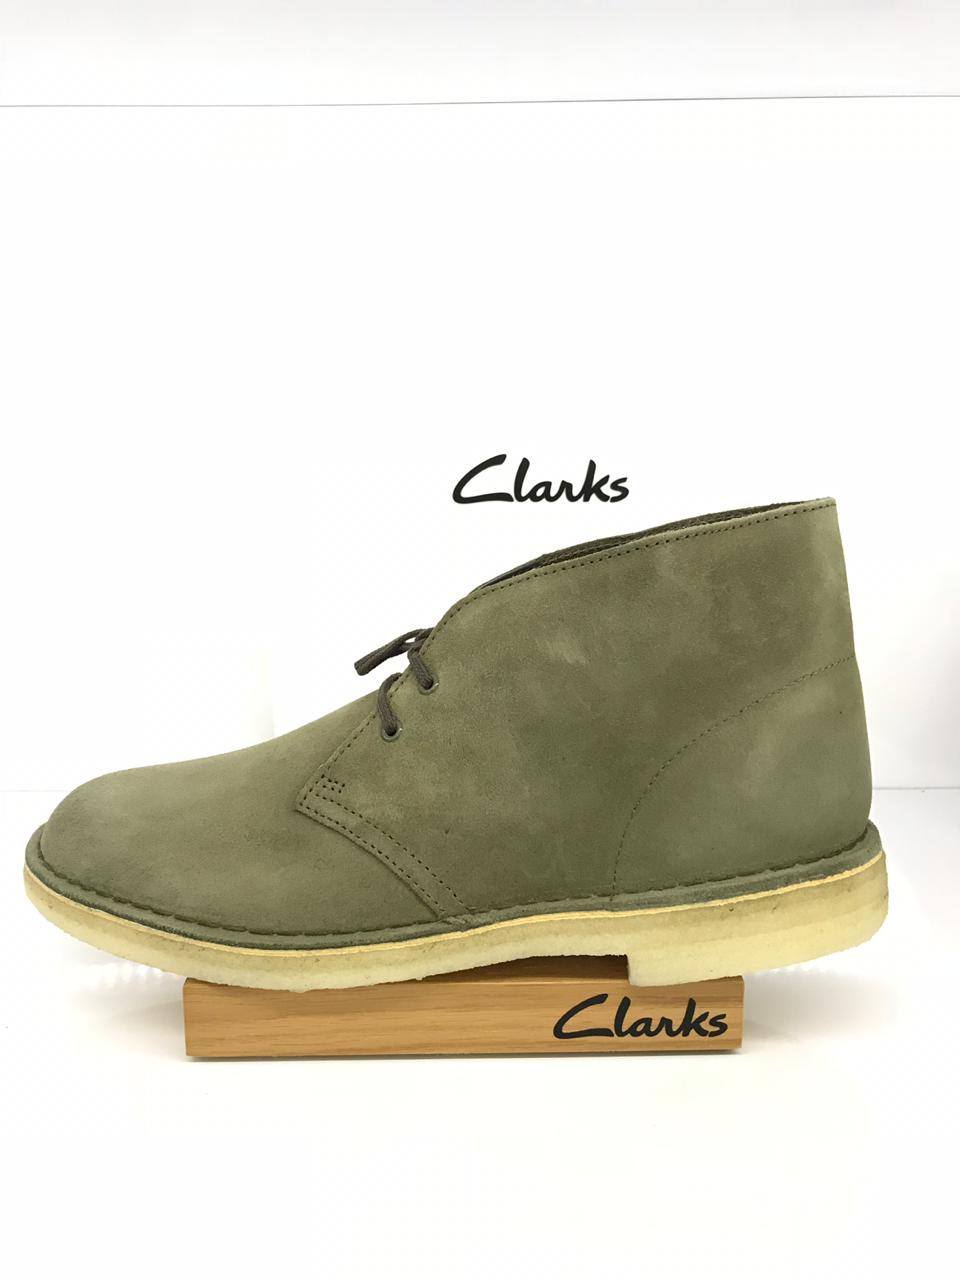 6556f15bb18839 Clarks Desert Boot (Olive) – Rennies Shoe Store